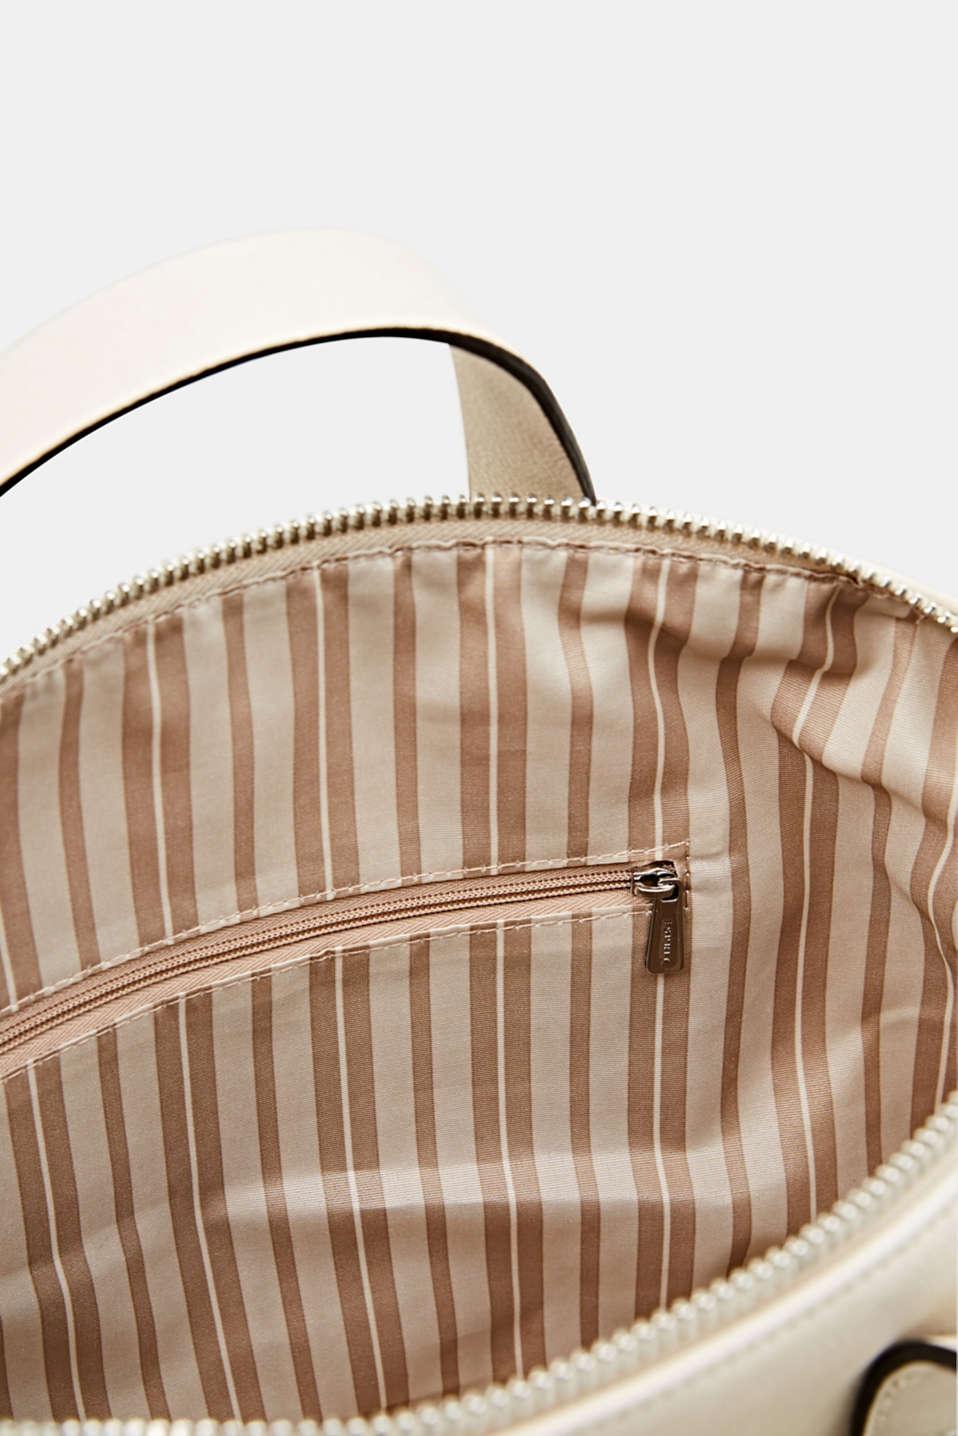 Faux leather handbag, CREAM BEIGE, detail image number 4